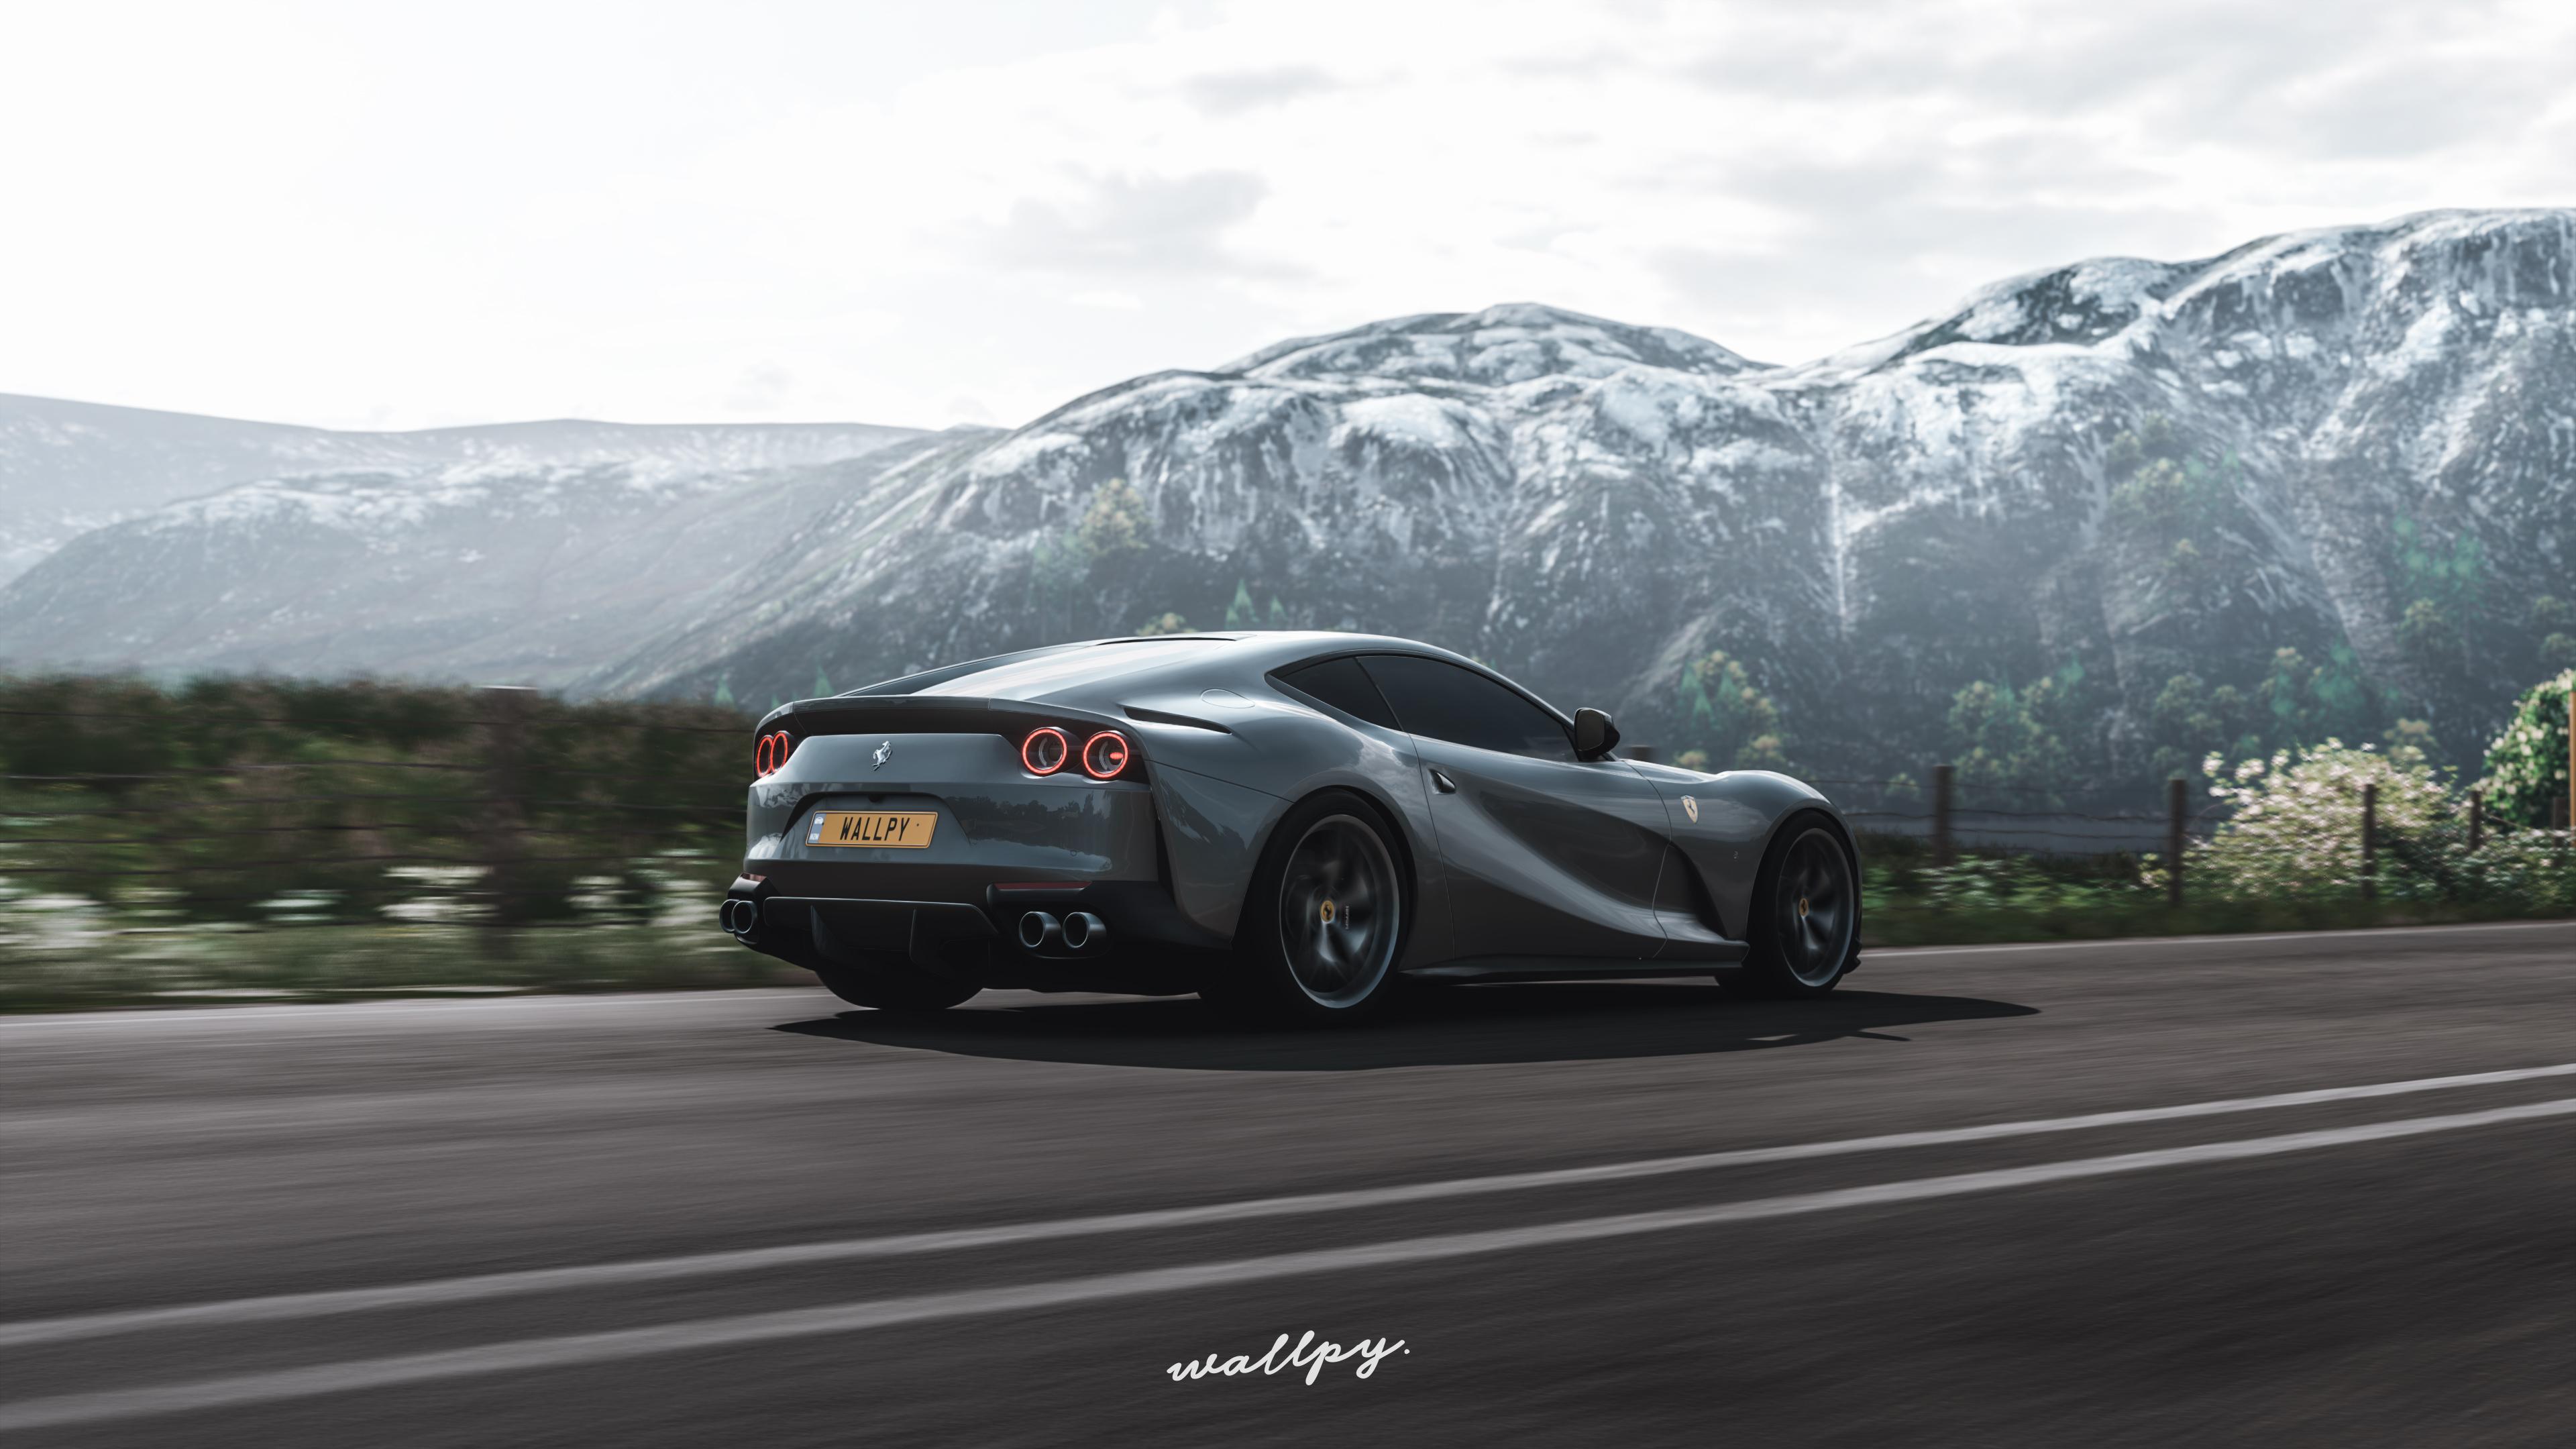 Forza Horizon 4 Wallpaper: 3840x2160 Forza Horizon 4 Ferrari 4k HD 4k Wallpapers